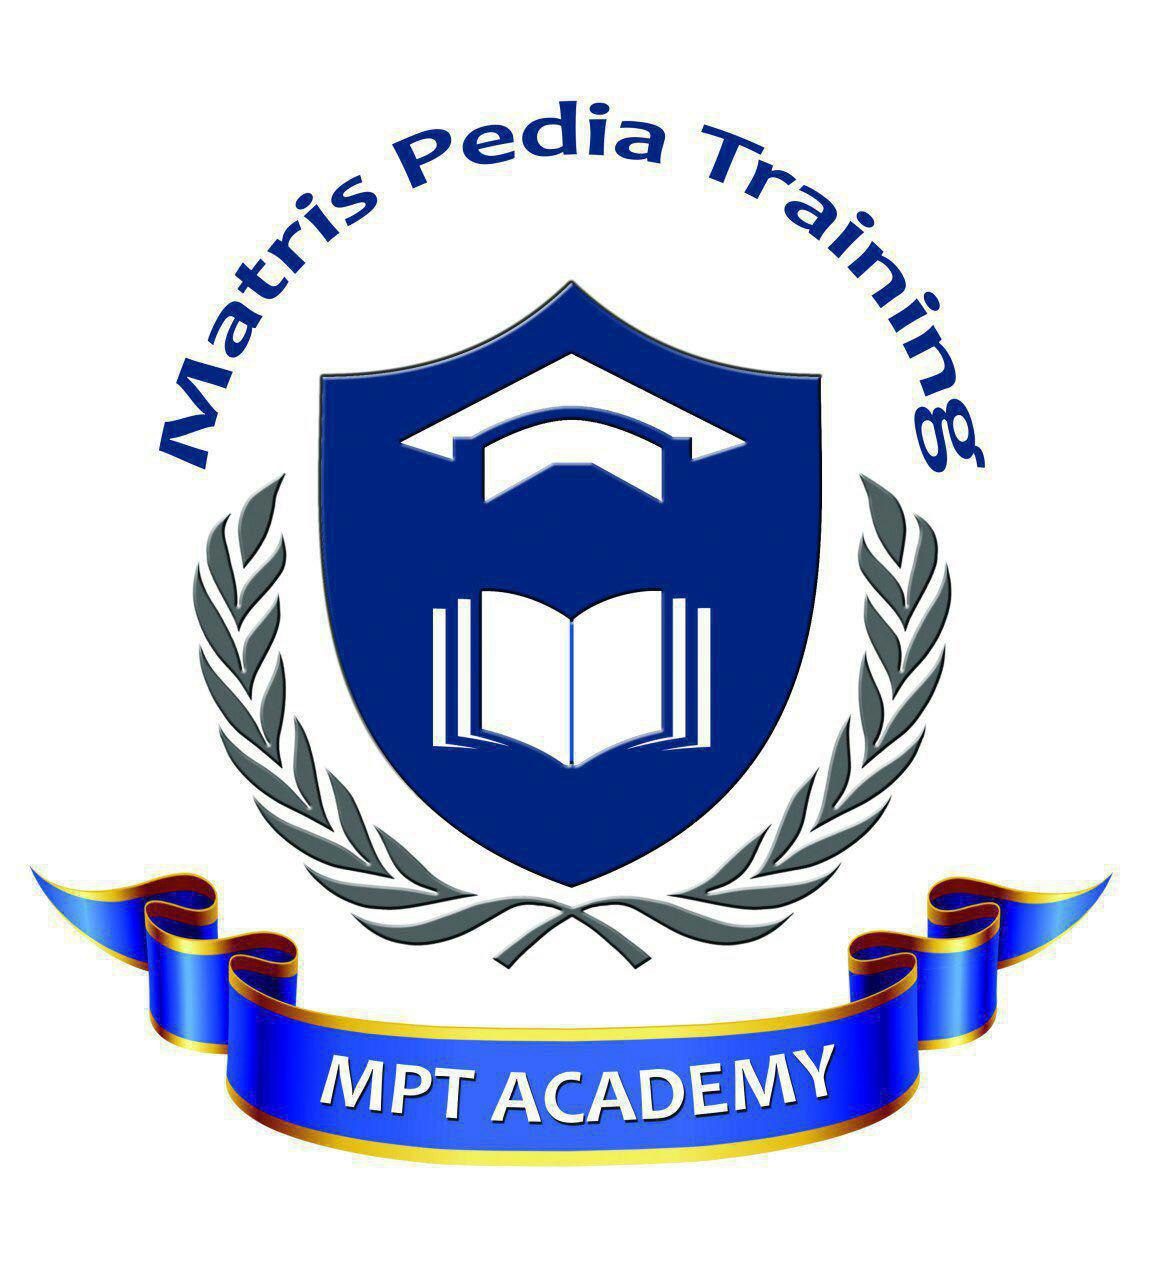 MPT ACADEMY